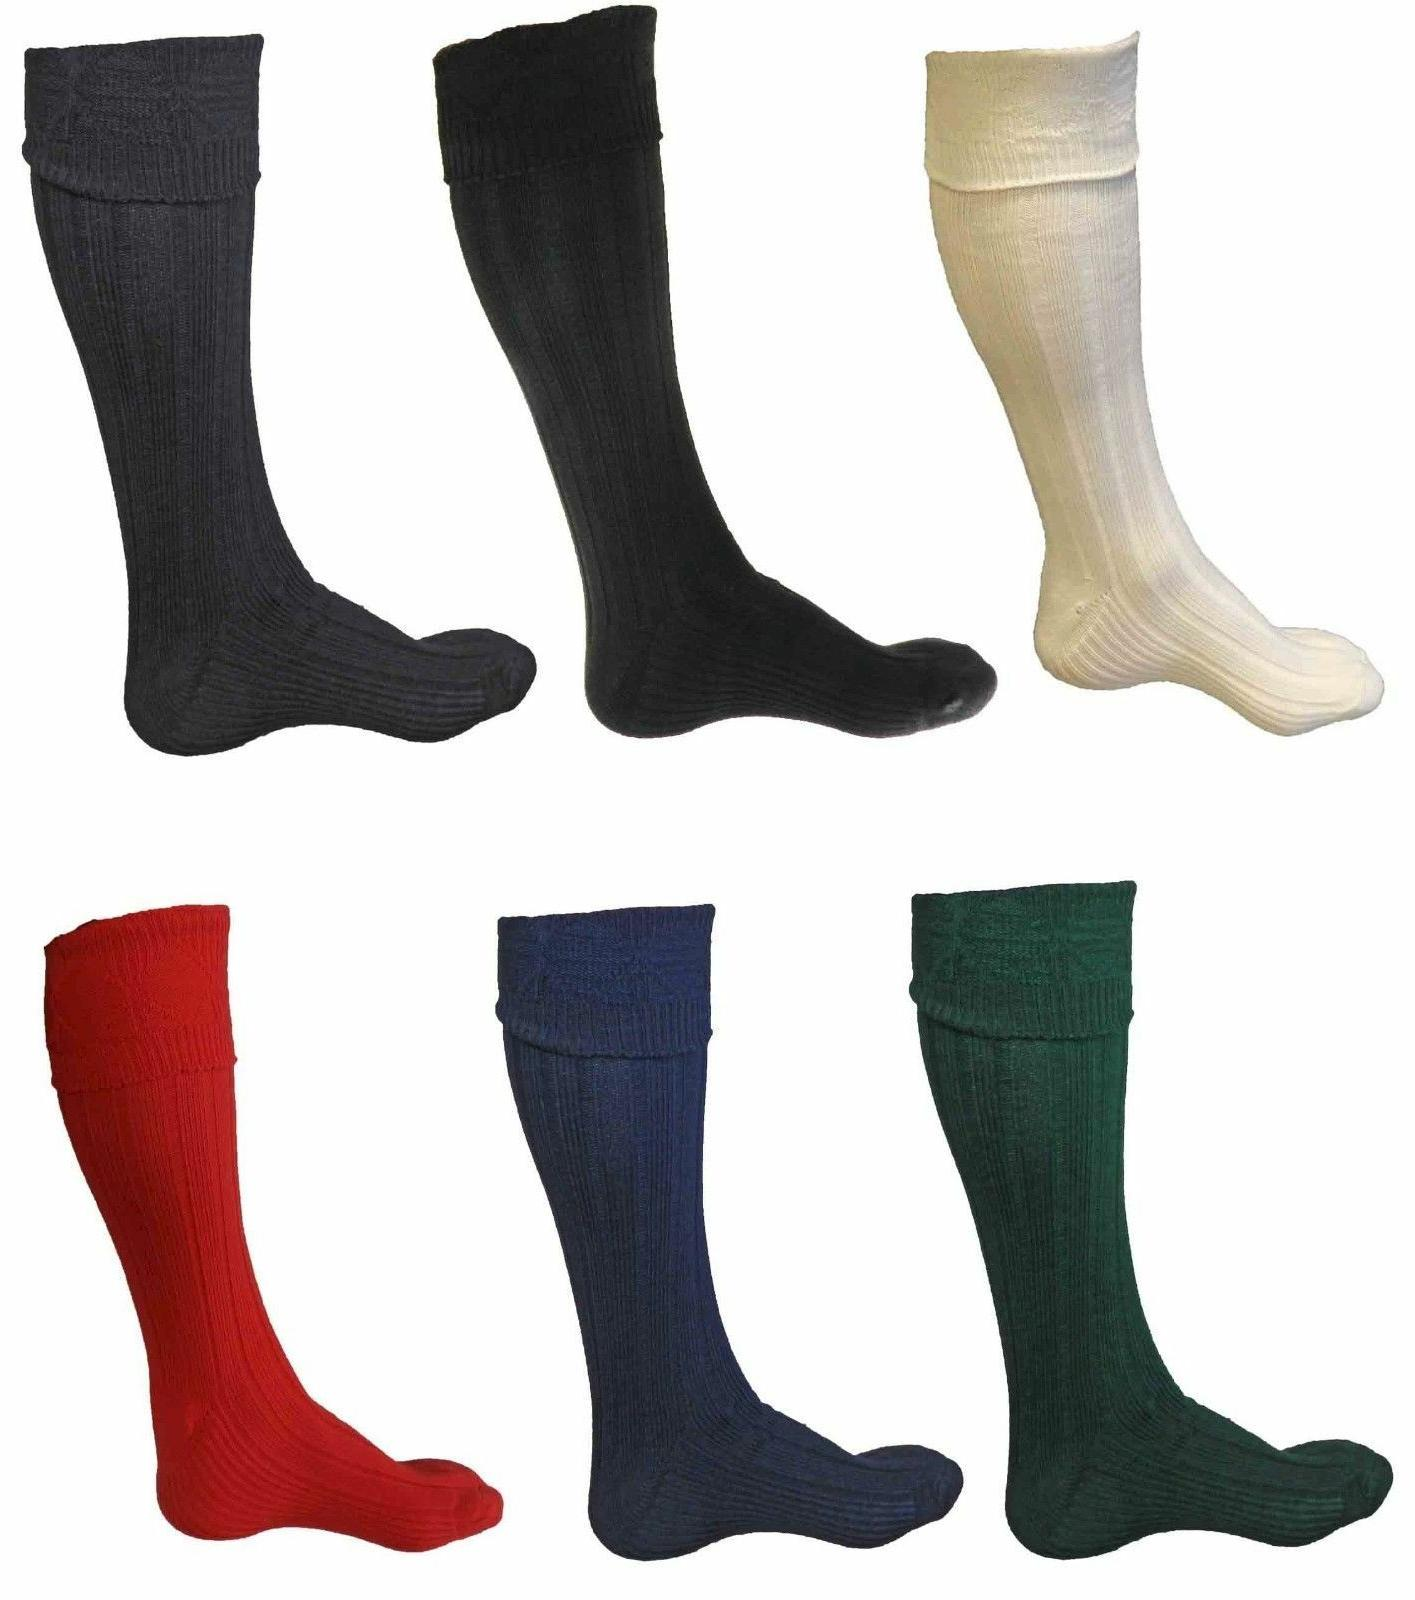 new scottish irish kilt hose socks men